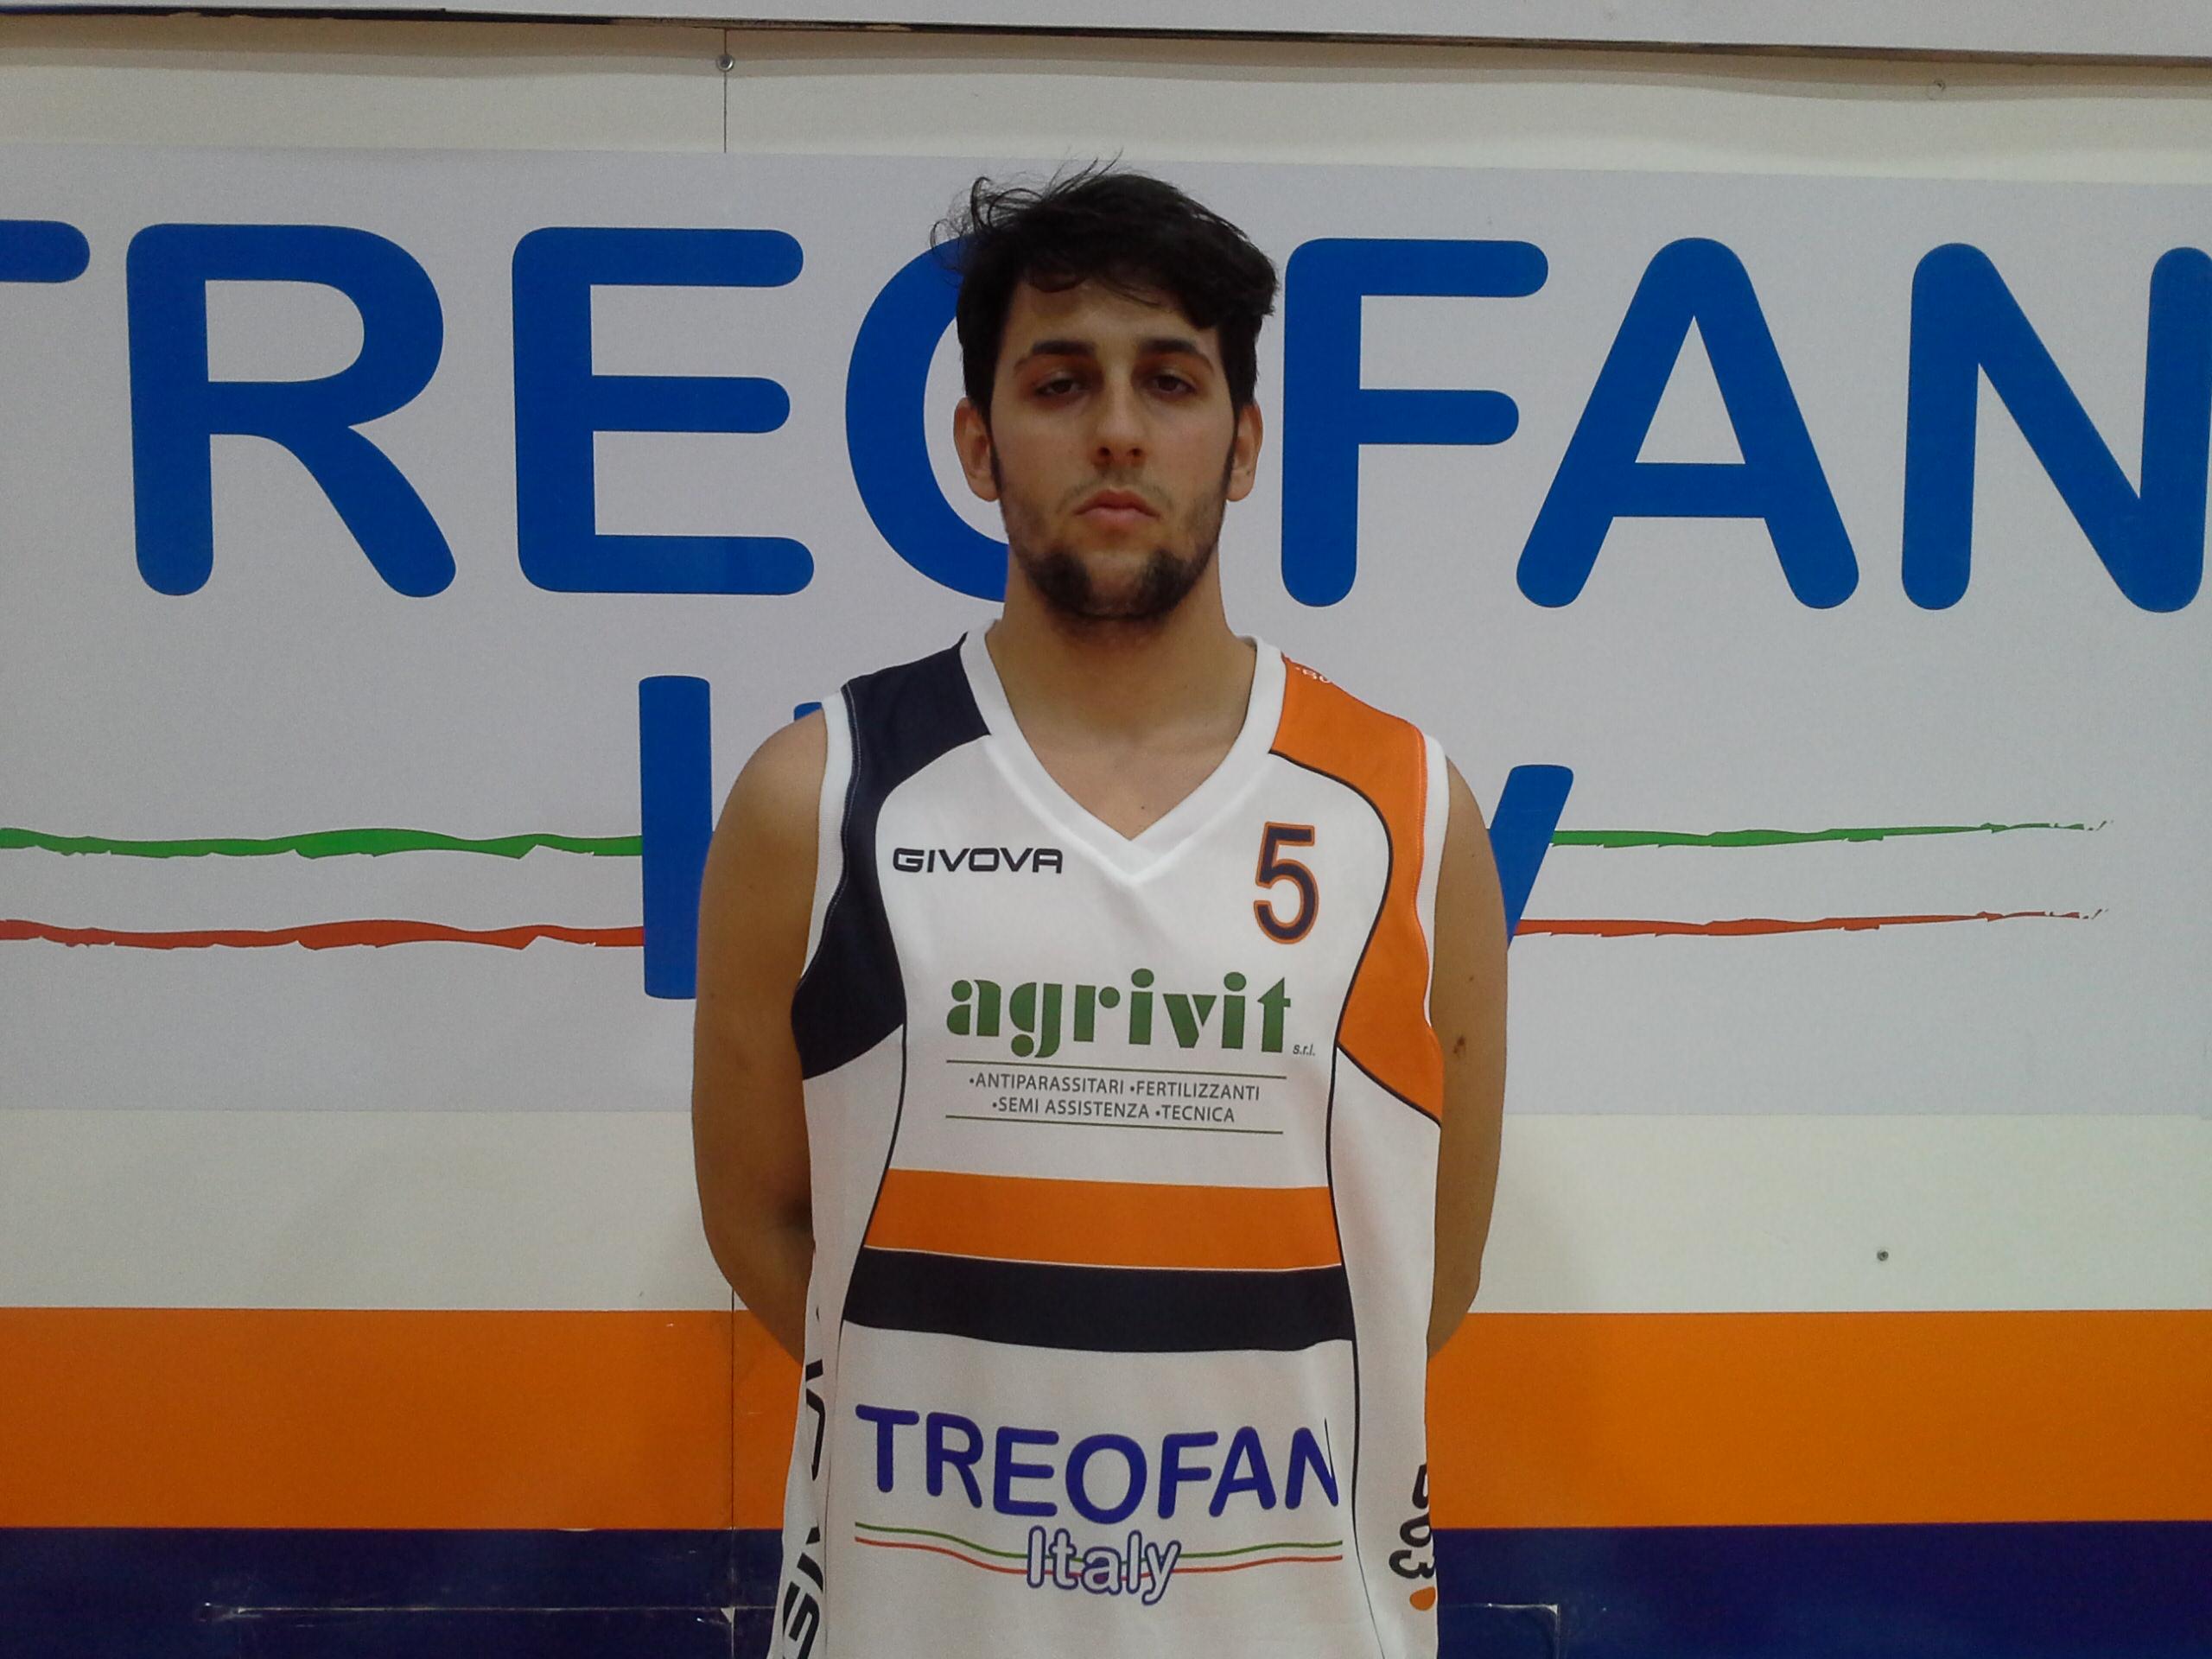 Federico Galardo